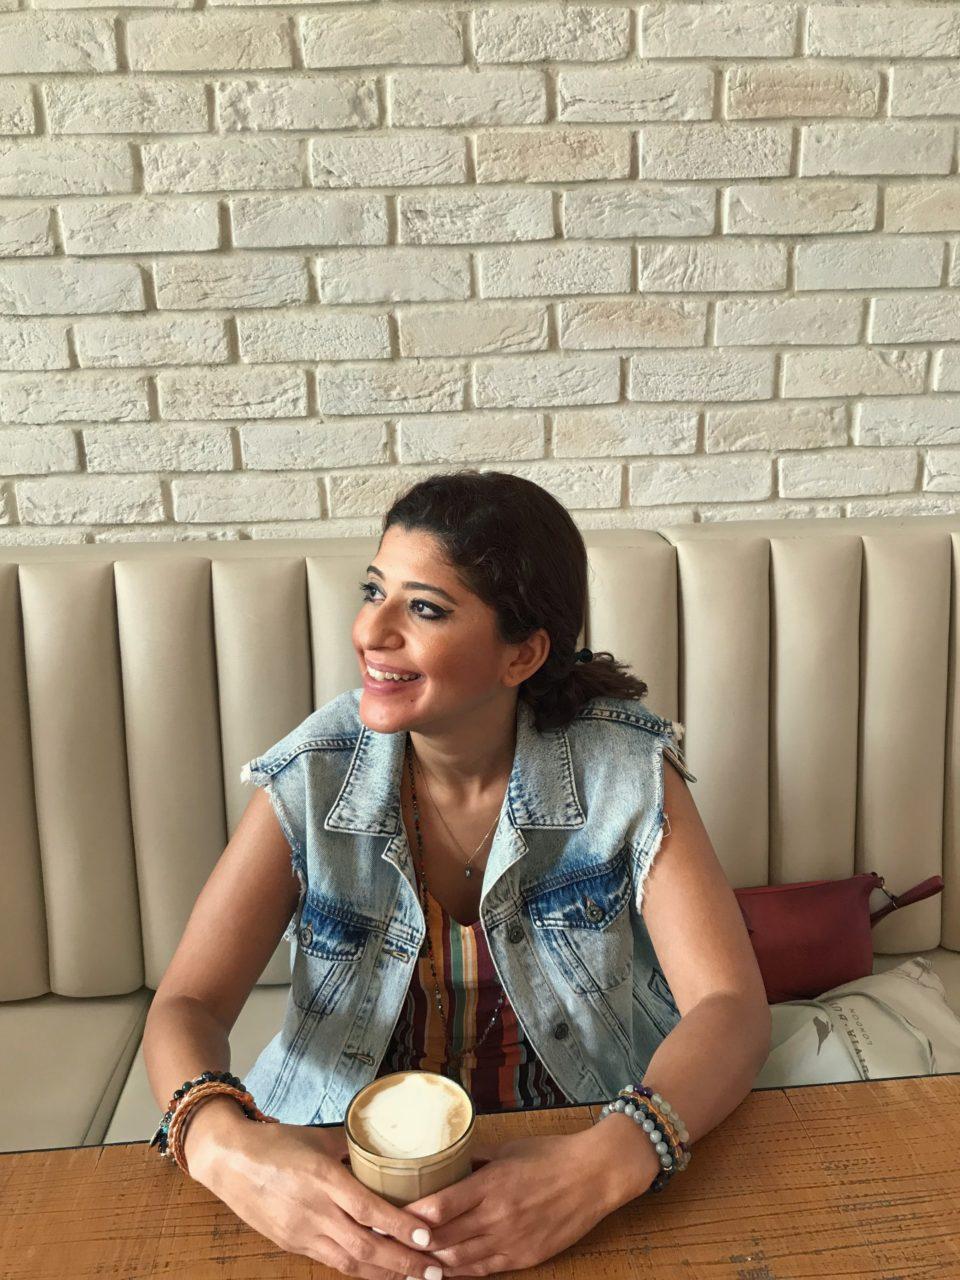 lifestyle redesign  - IMG 1125 edited 960x1280 - Lifestyle Sunday: Review of IZU Bakery in Dubai